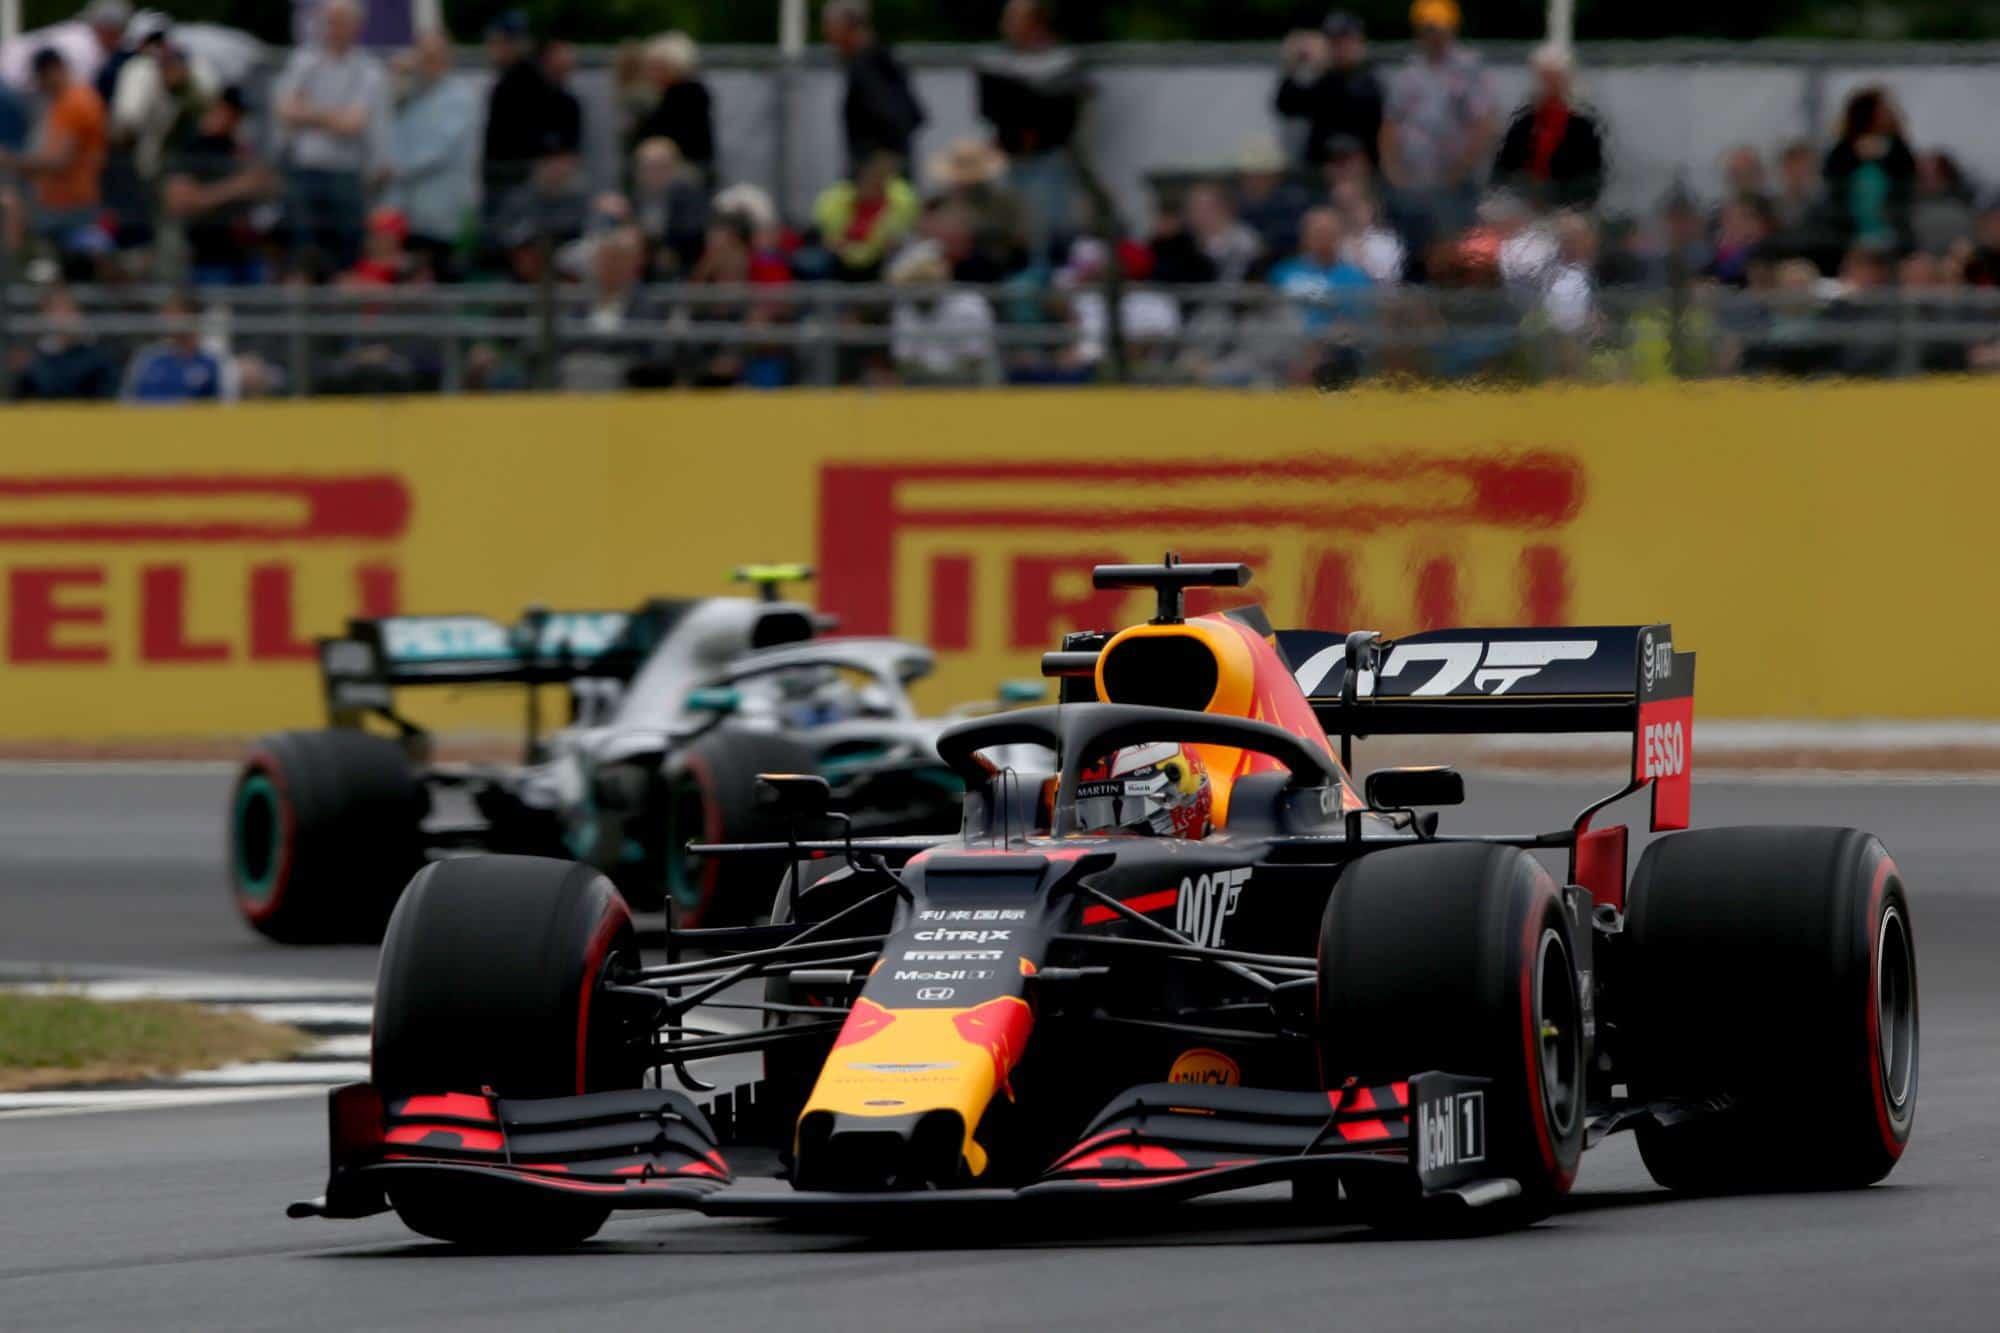 Max Verstappen Red Bull RB15 leads Valtteri Bottas Mercedes F1 W10 FP3 British GP F1 2019 Photo Red Bull